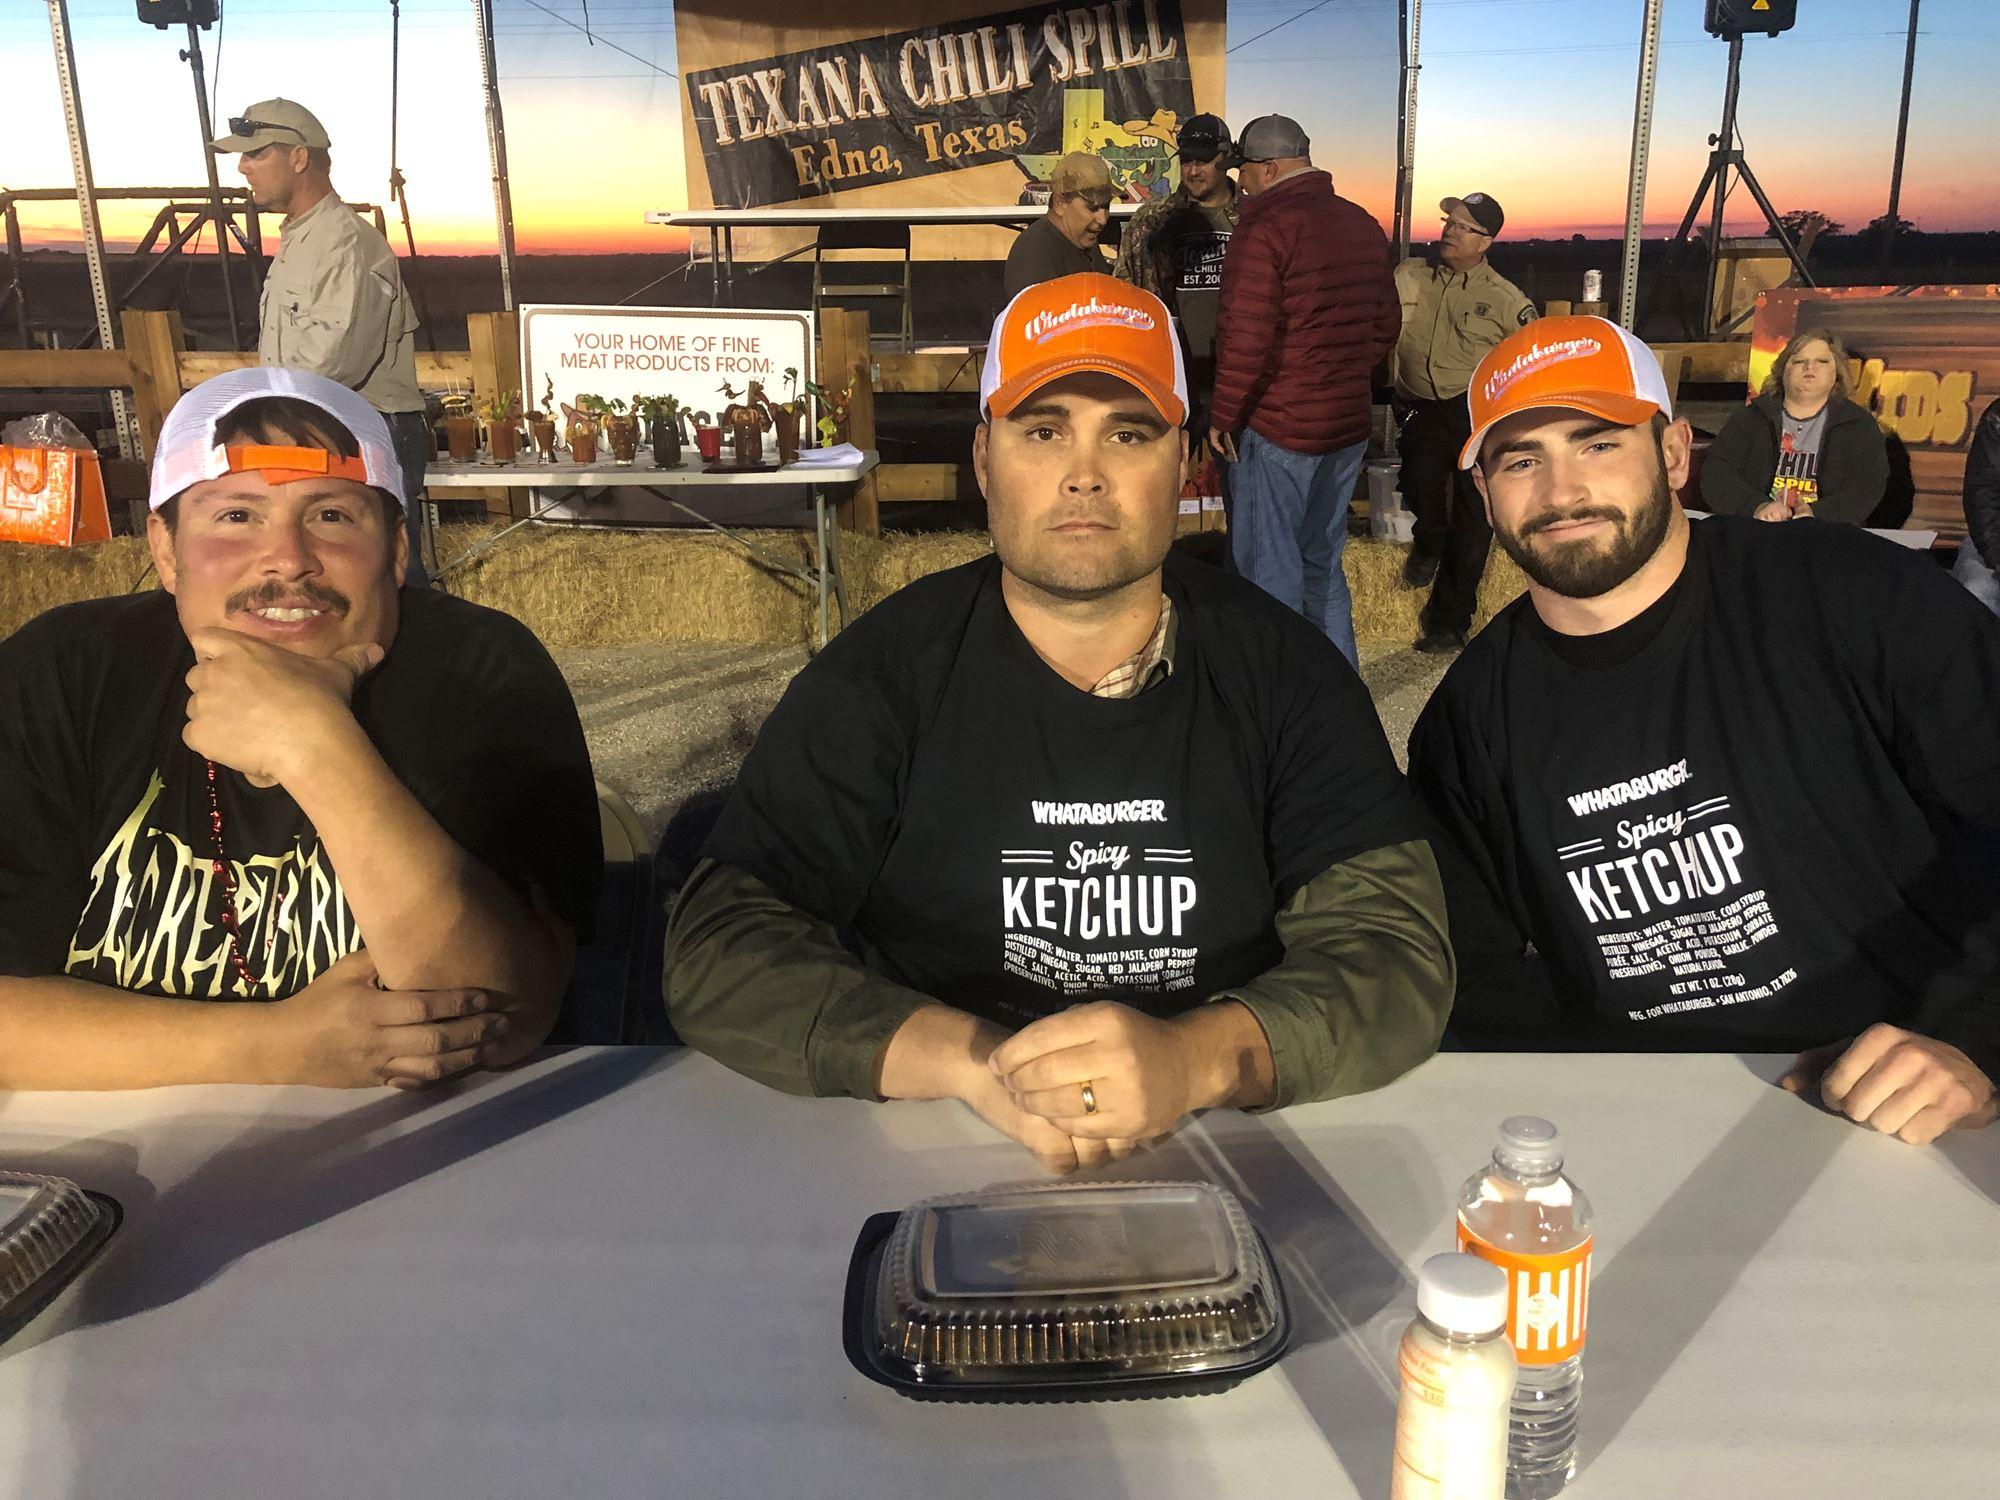 Texana Heat Jalapeno Eating Contest